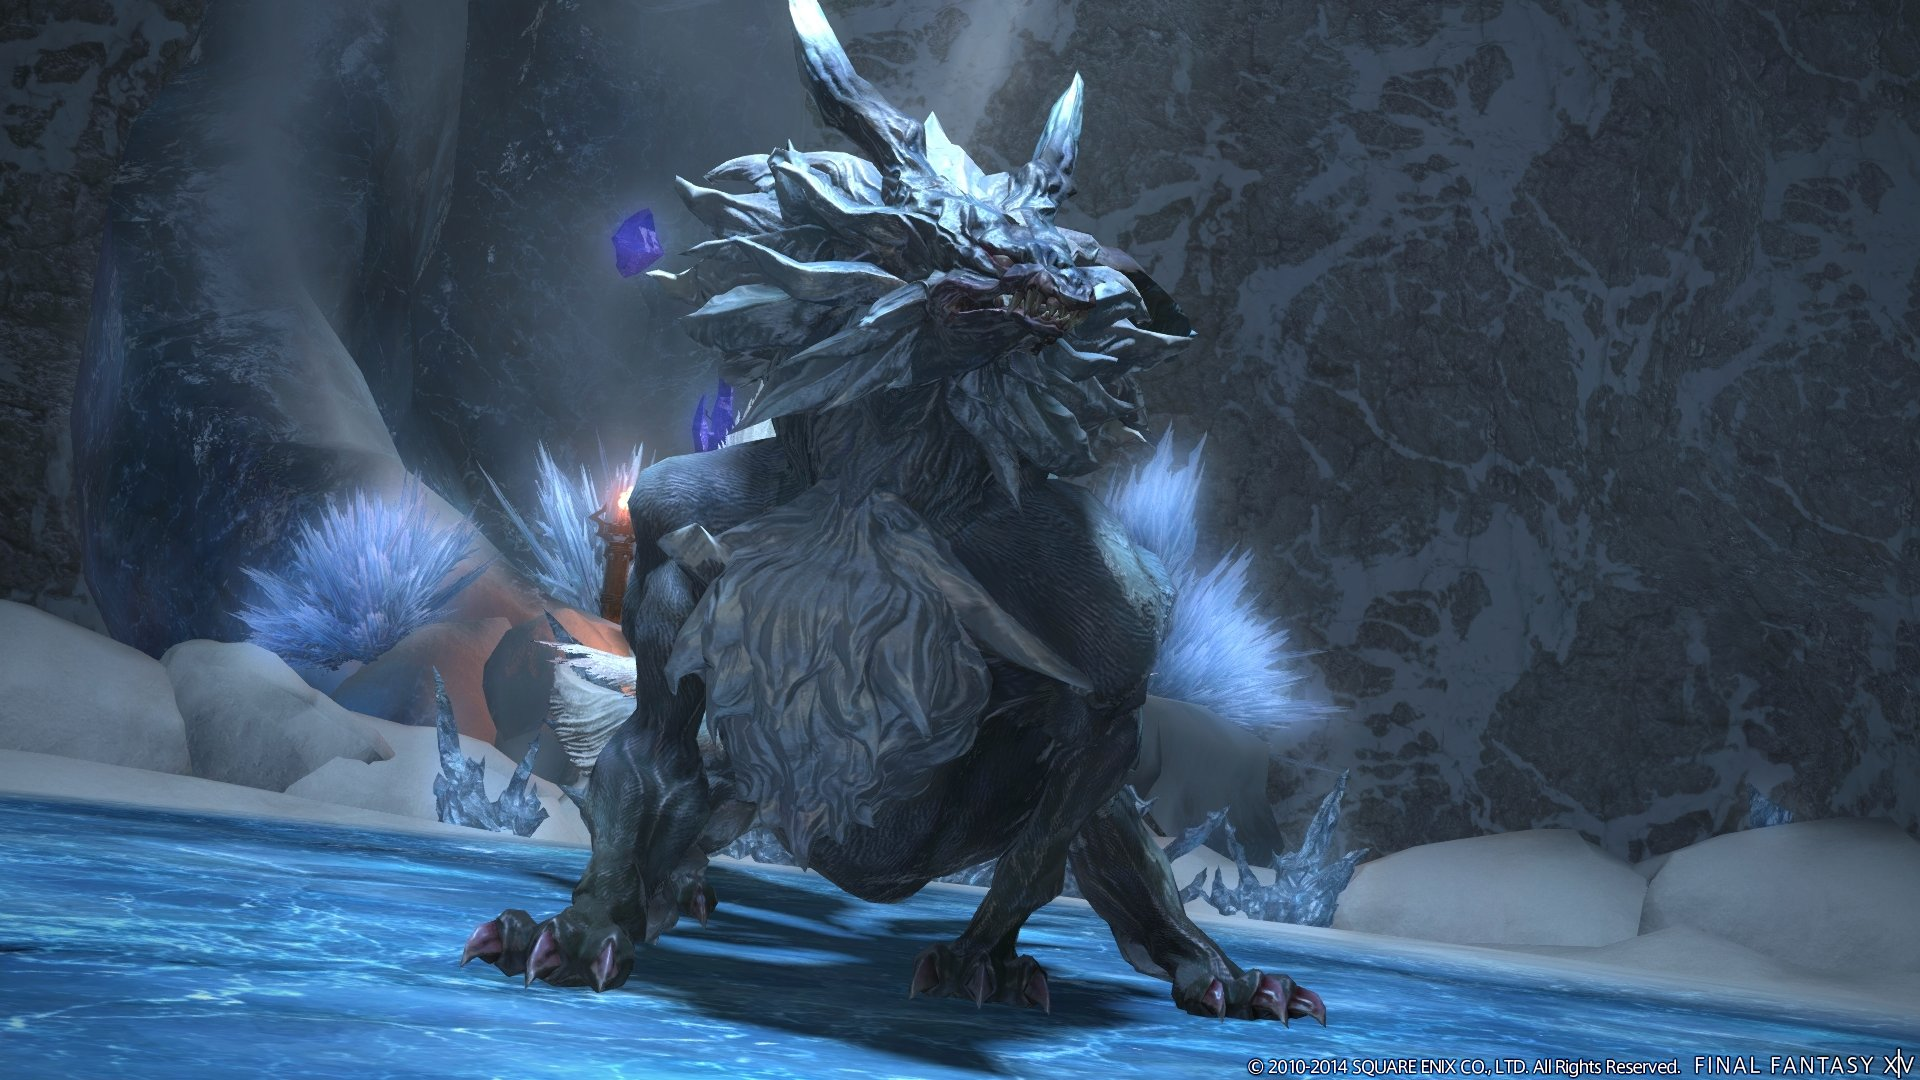 Final Fantasy XIV: A Realm Reborn 2 4 Dreams of Ice Content